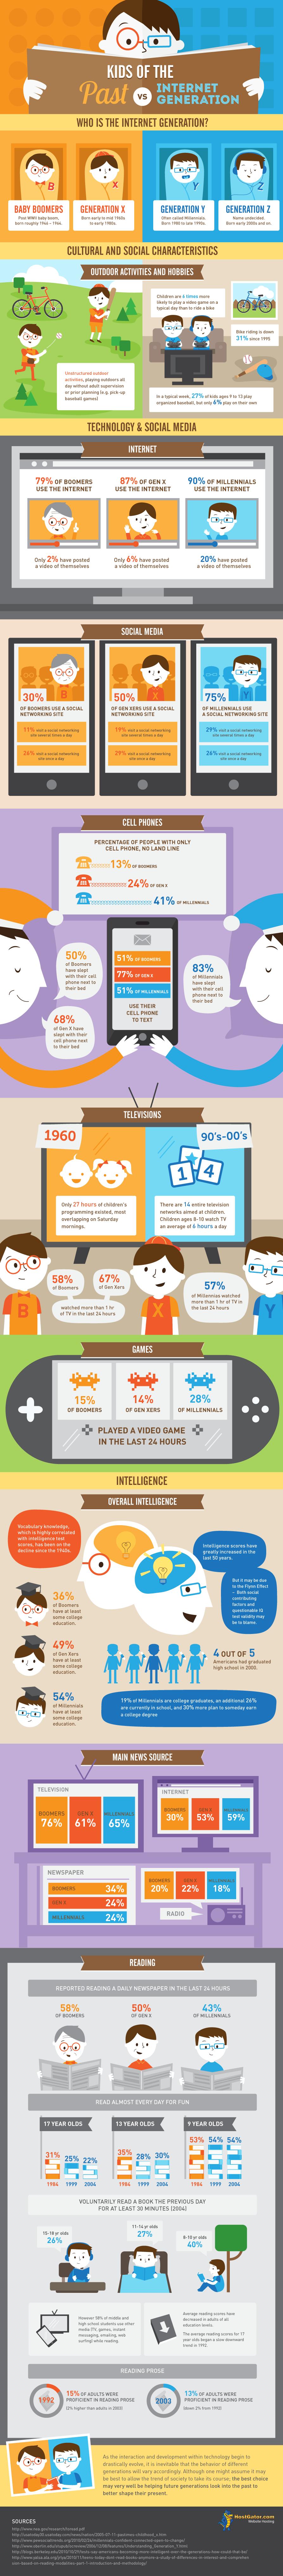 Kids of pasts versus kids of internet generation